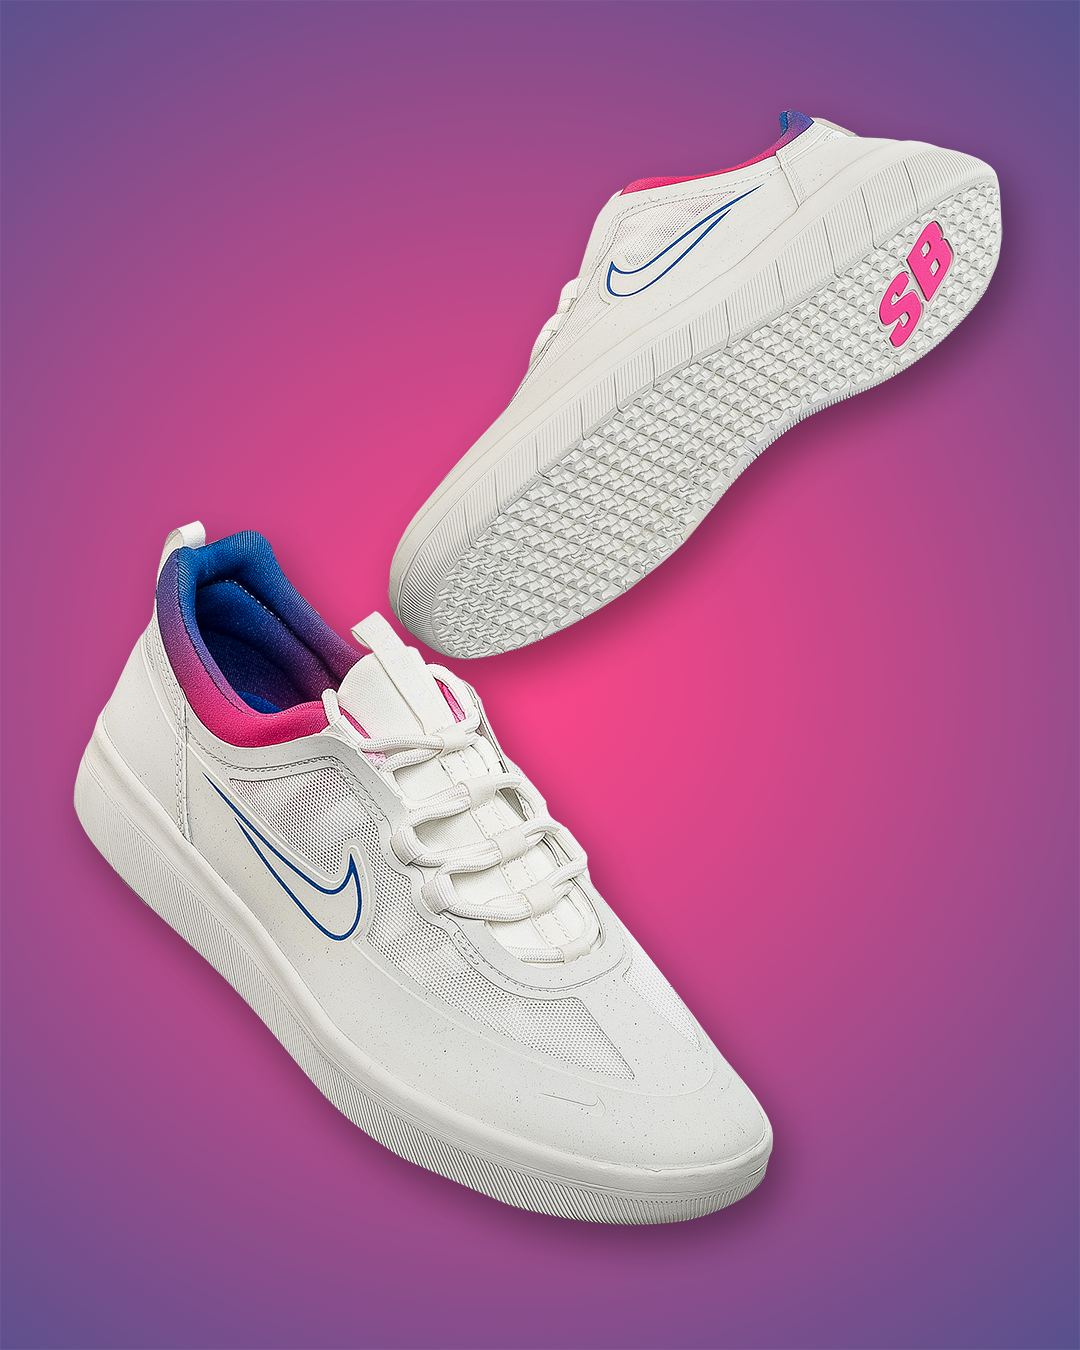 tema tarjeta Antídoto  Product of the week: Nike SB Nyjah Free 2 | Blog Snowboard Zezula